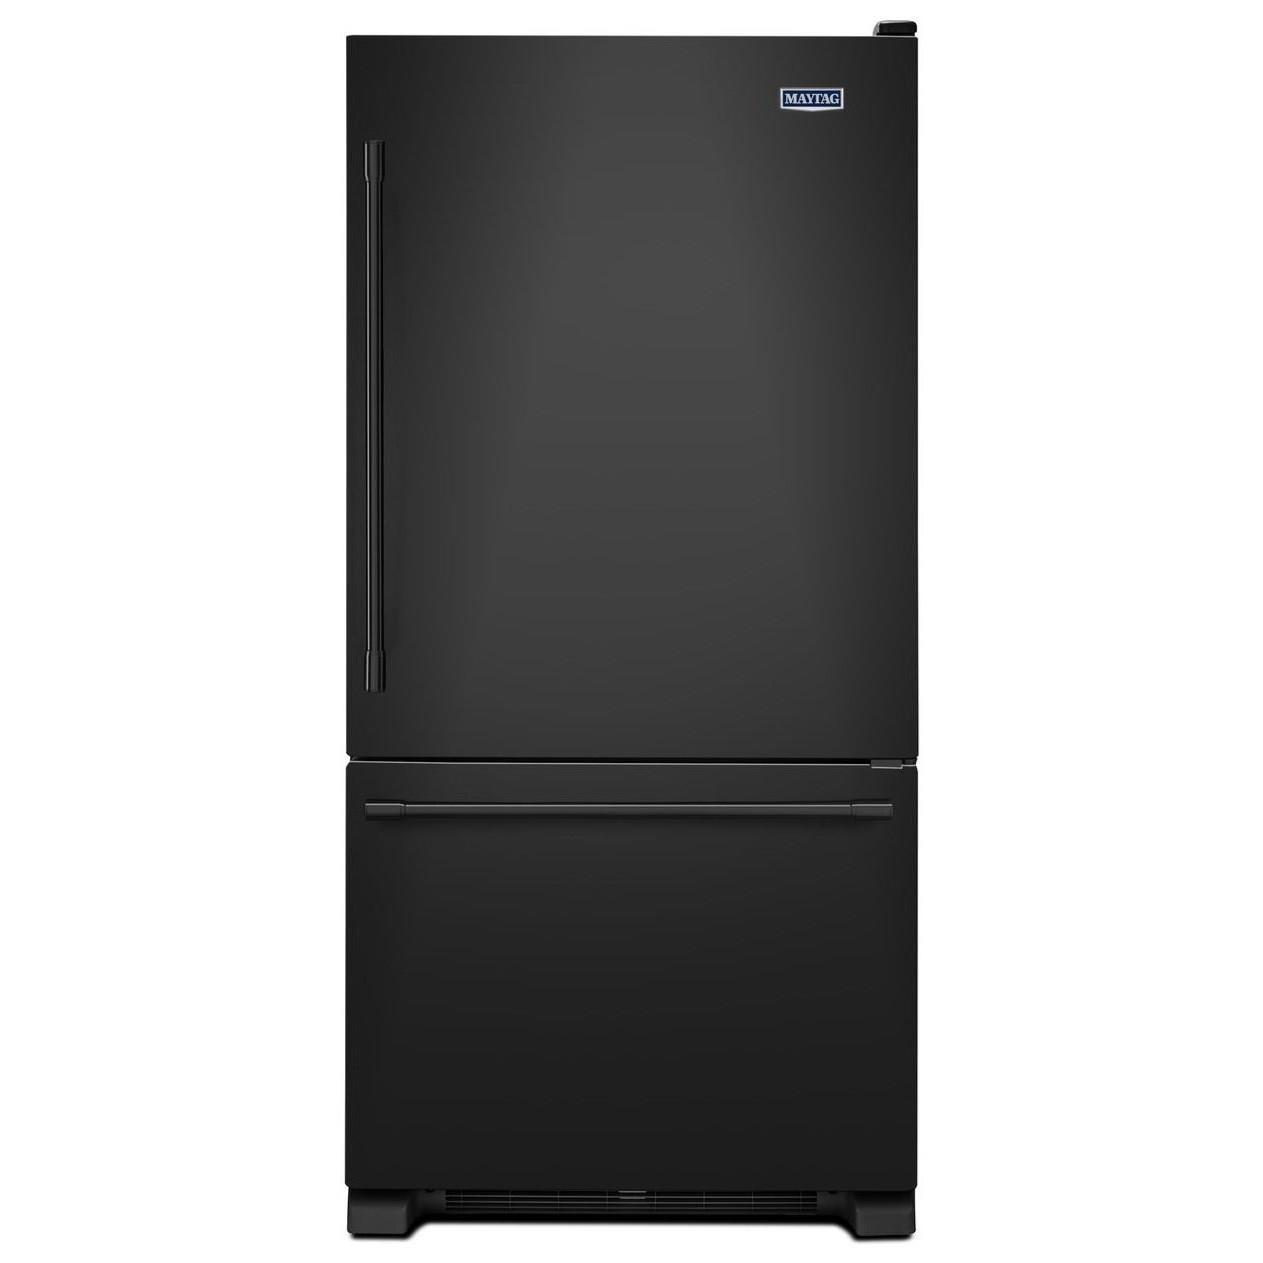 33-Inch 22 Cu. Ft. Bottom Mount Refrigerator